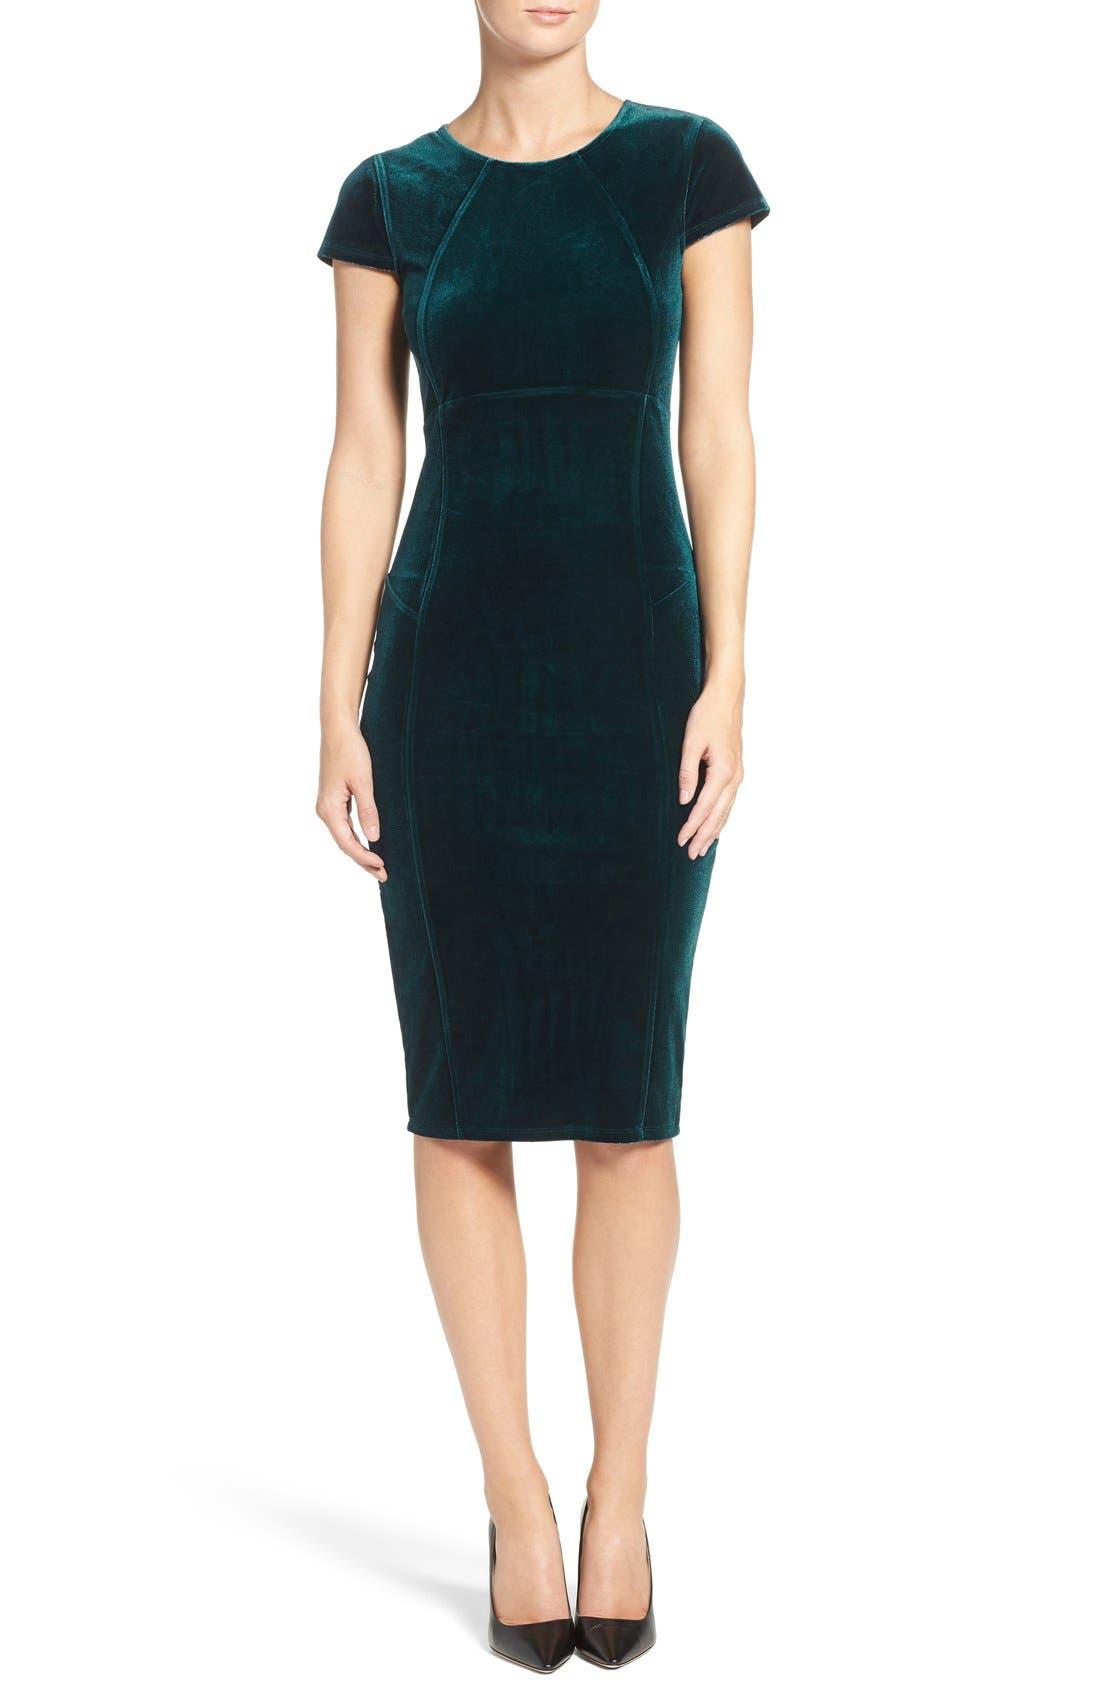 Alternate Image 1 Selected - Felicity & Coco Velvet Midi Dress (Nordstrom Exclusive)